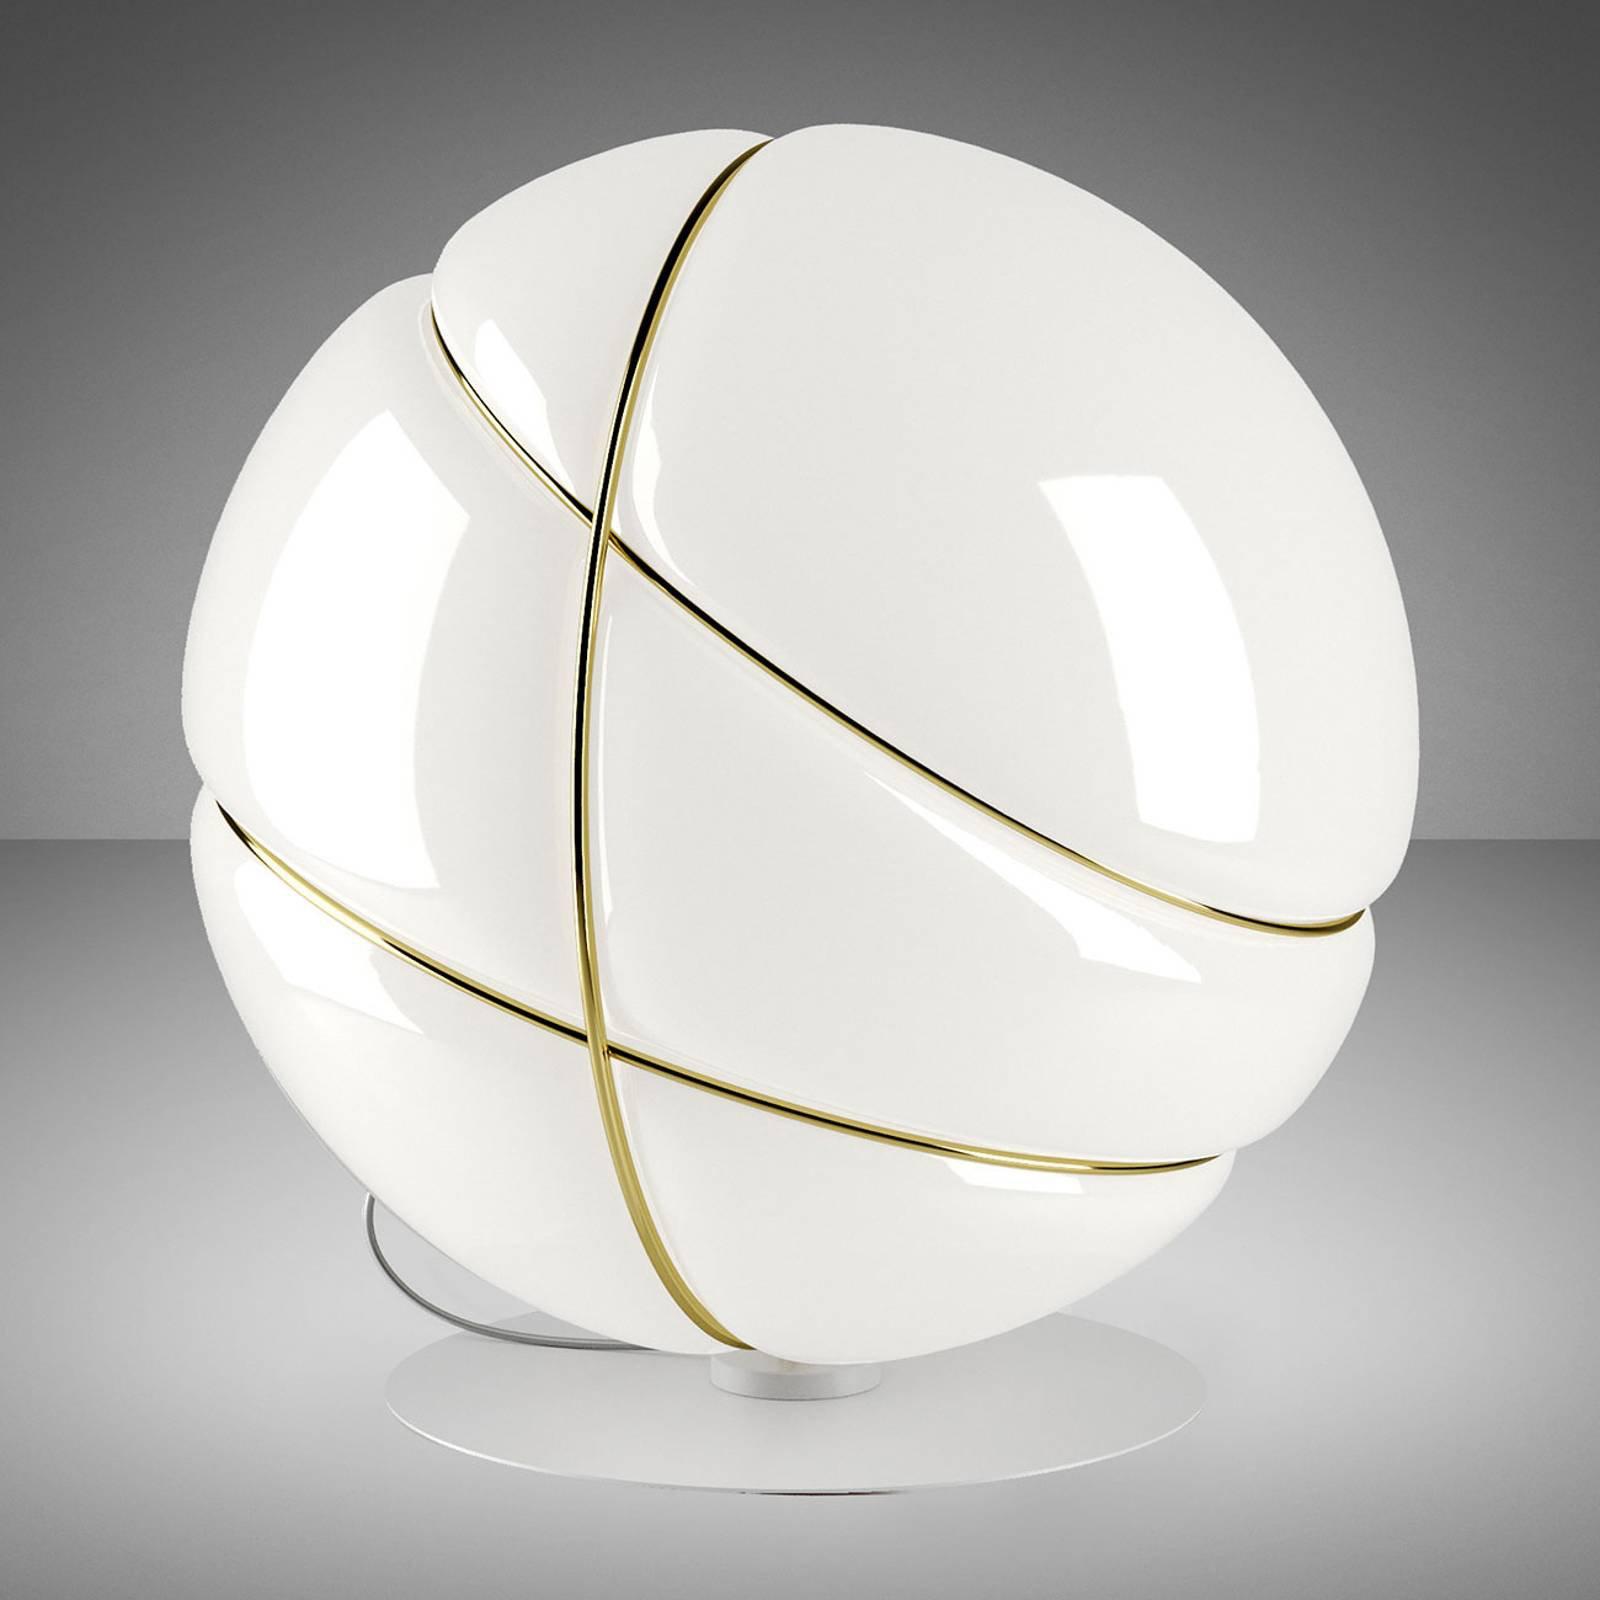 Fabbian Armilla bordlampe av glass, hvit, gull